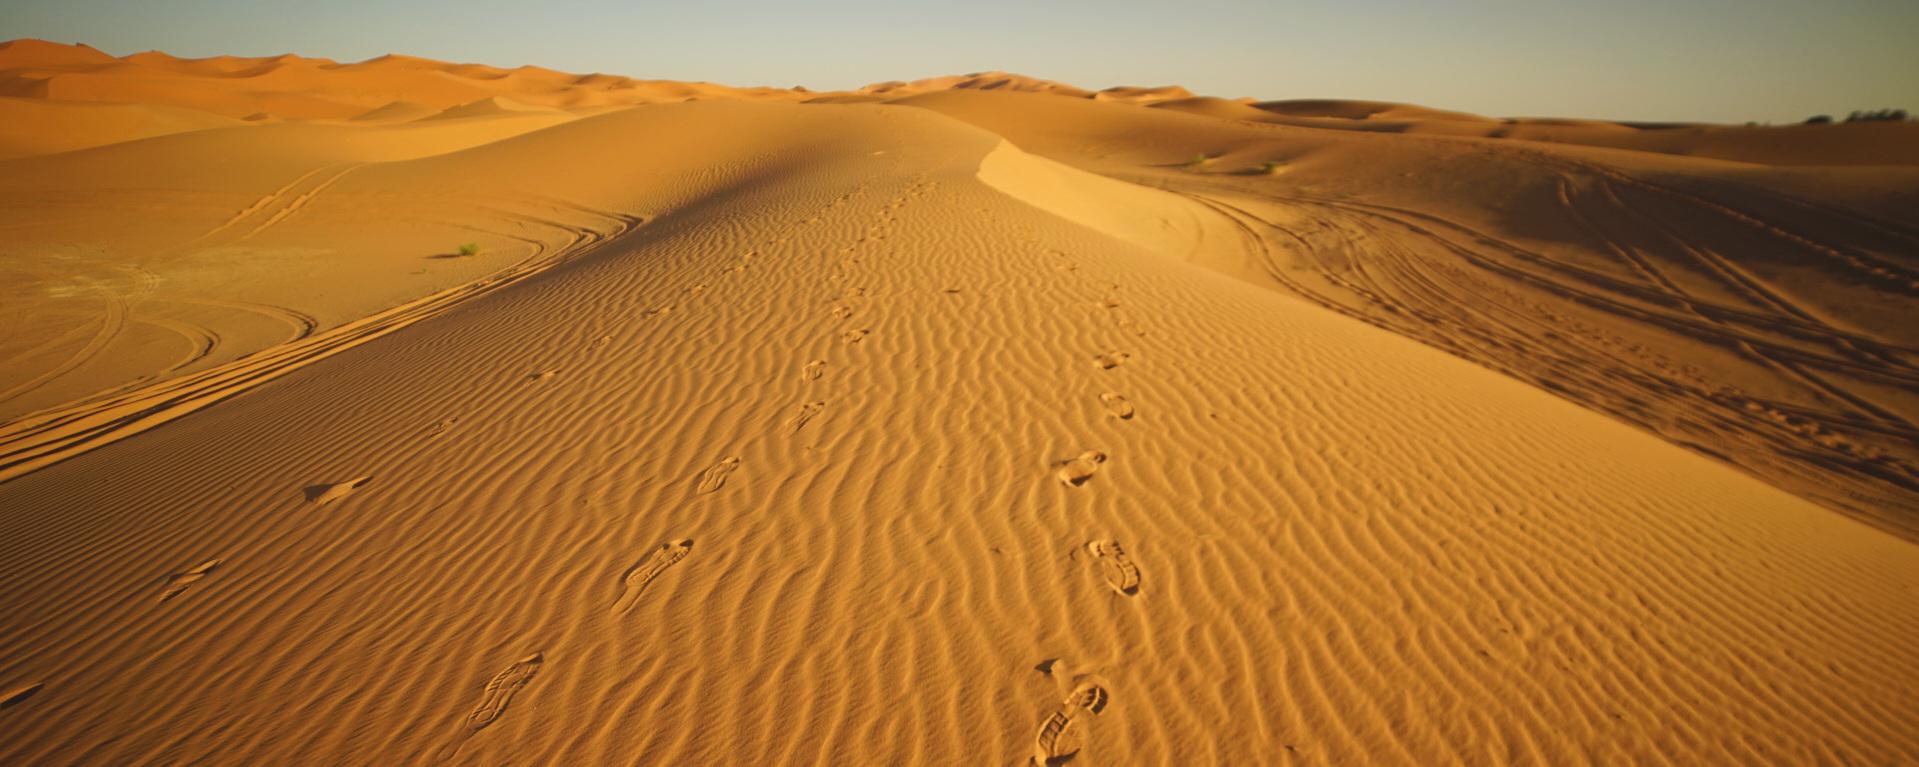 desierto active woman